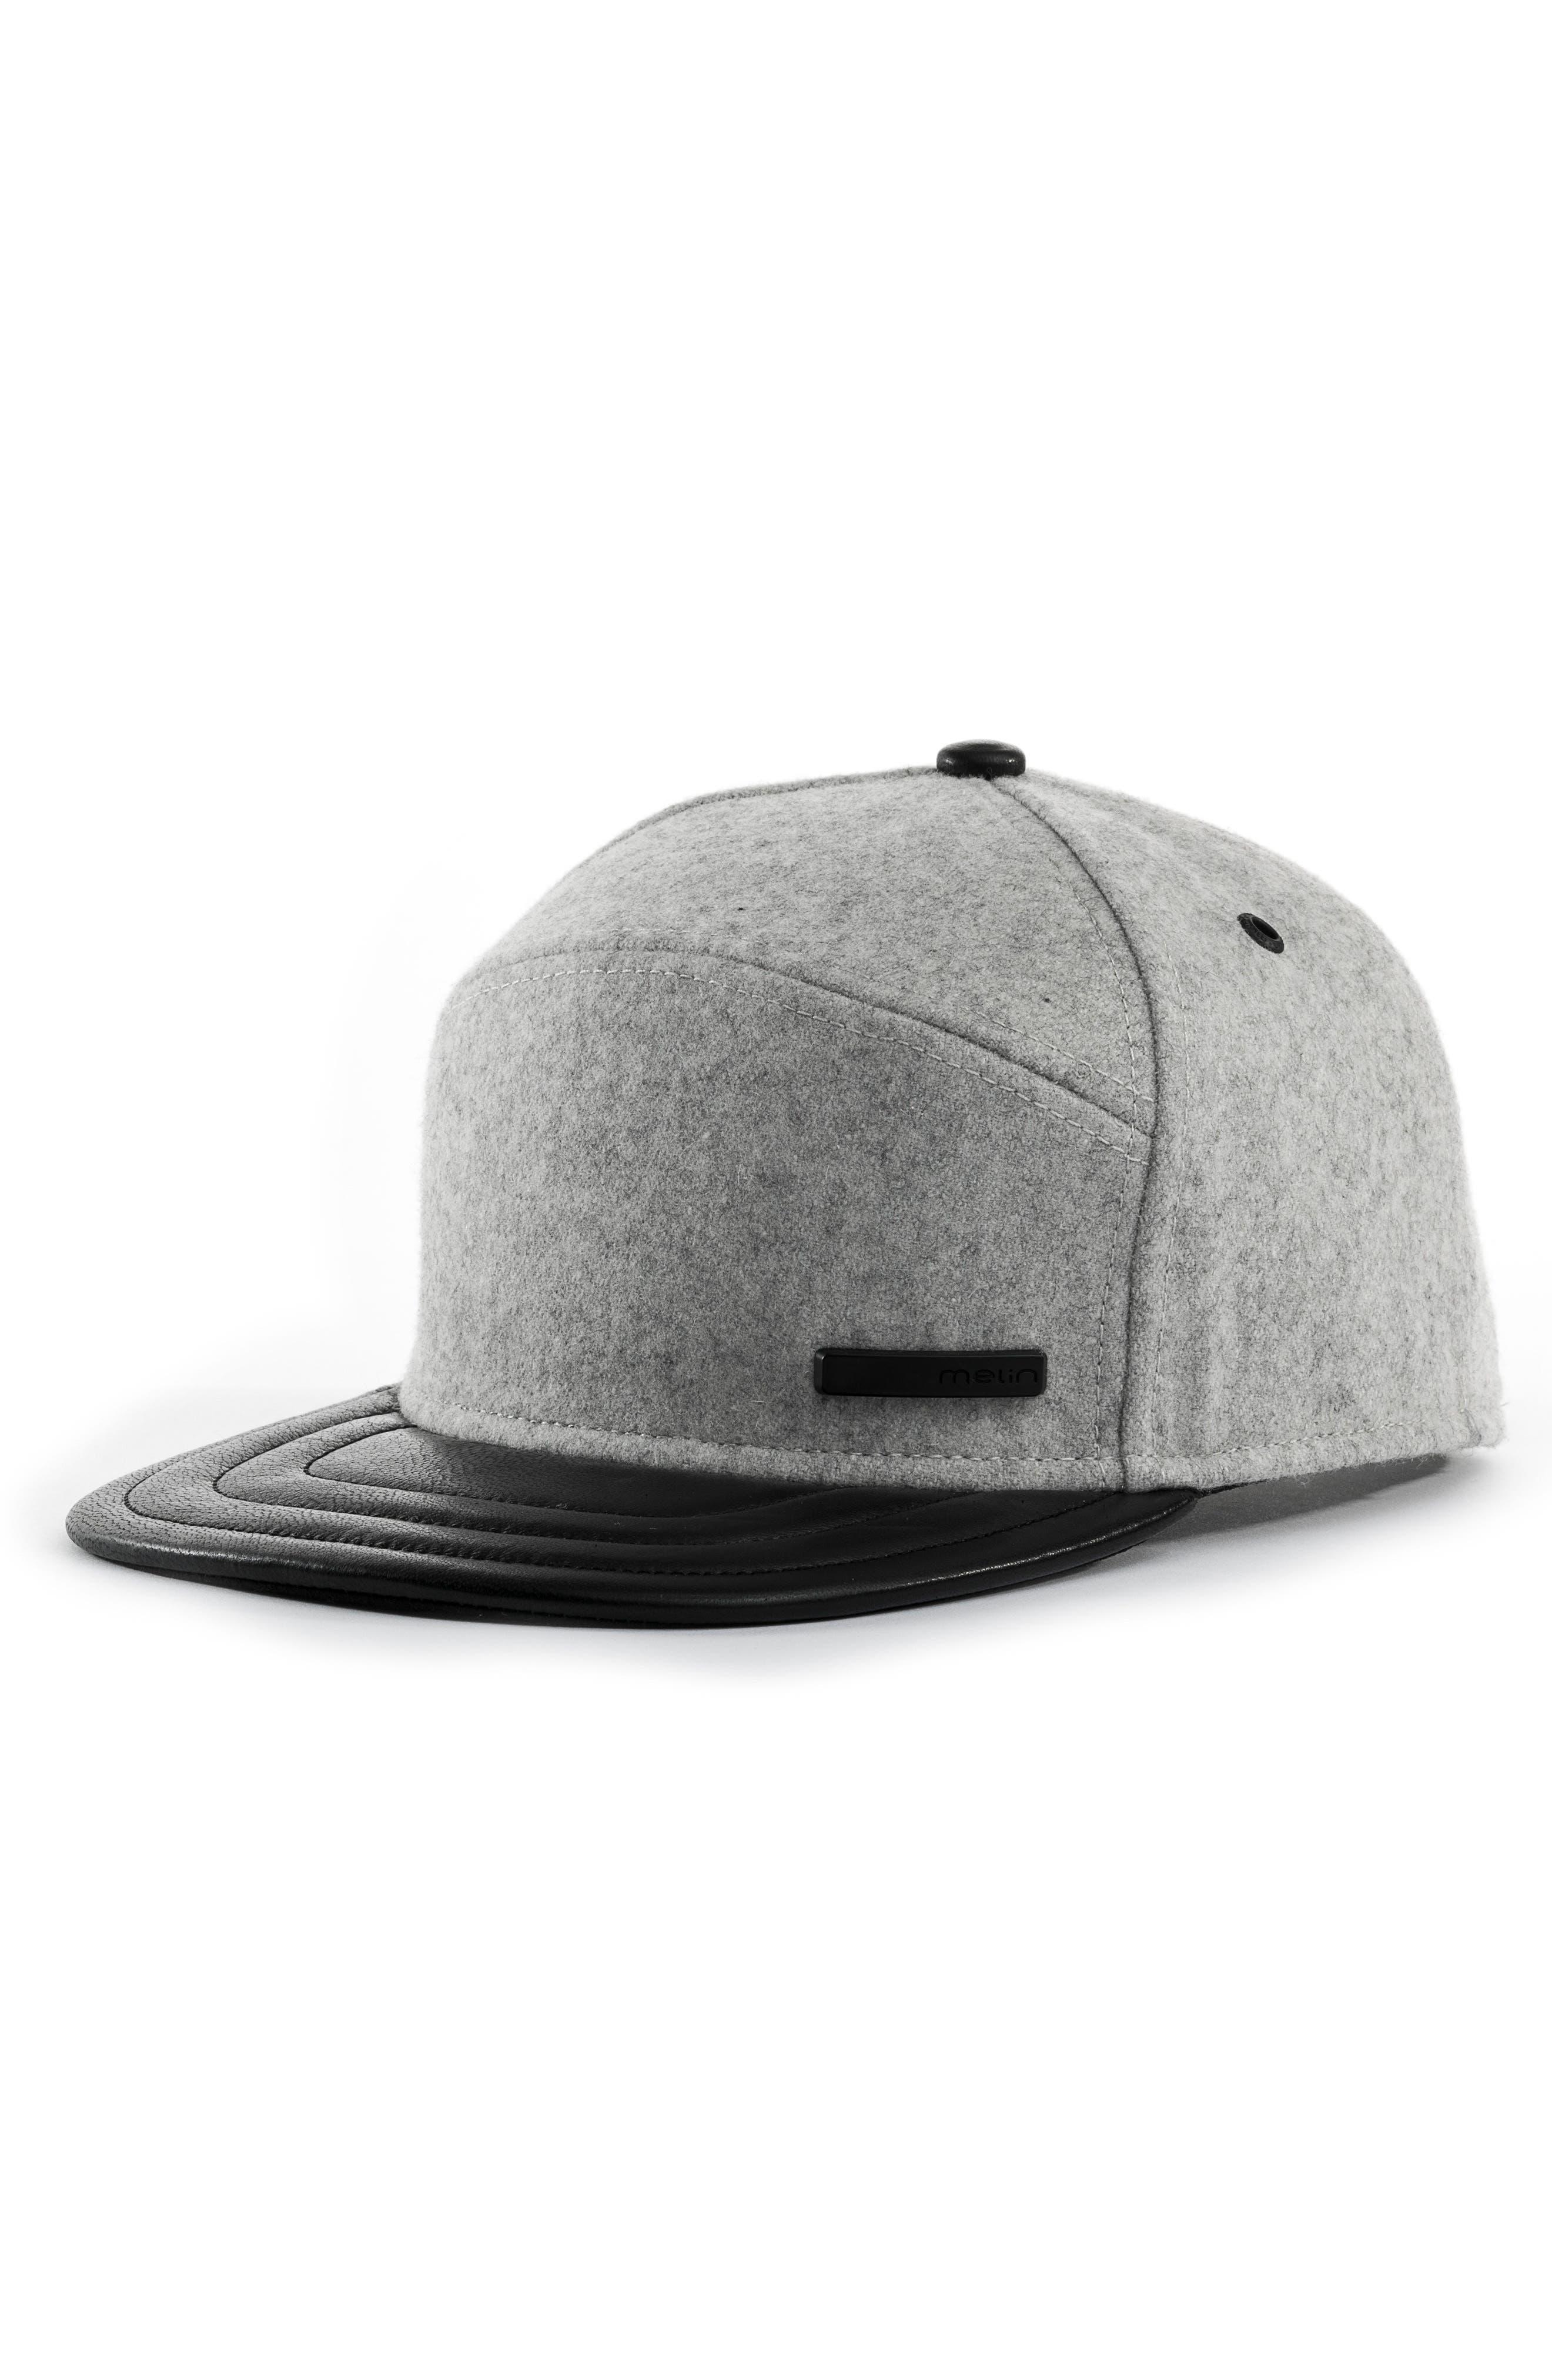 MELIN Mini Bar Deluxe Baseball Cap, Main, color, LIGHT HEATHER GREY